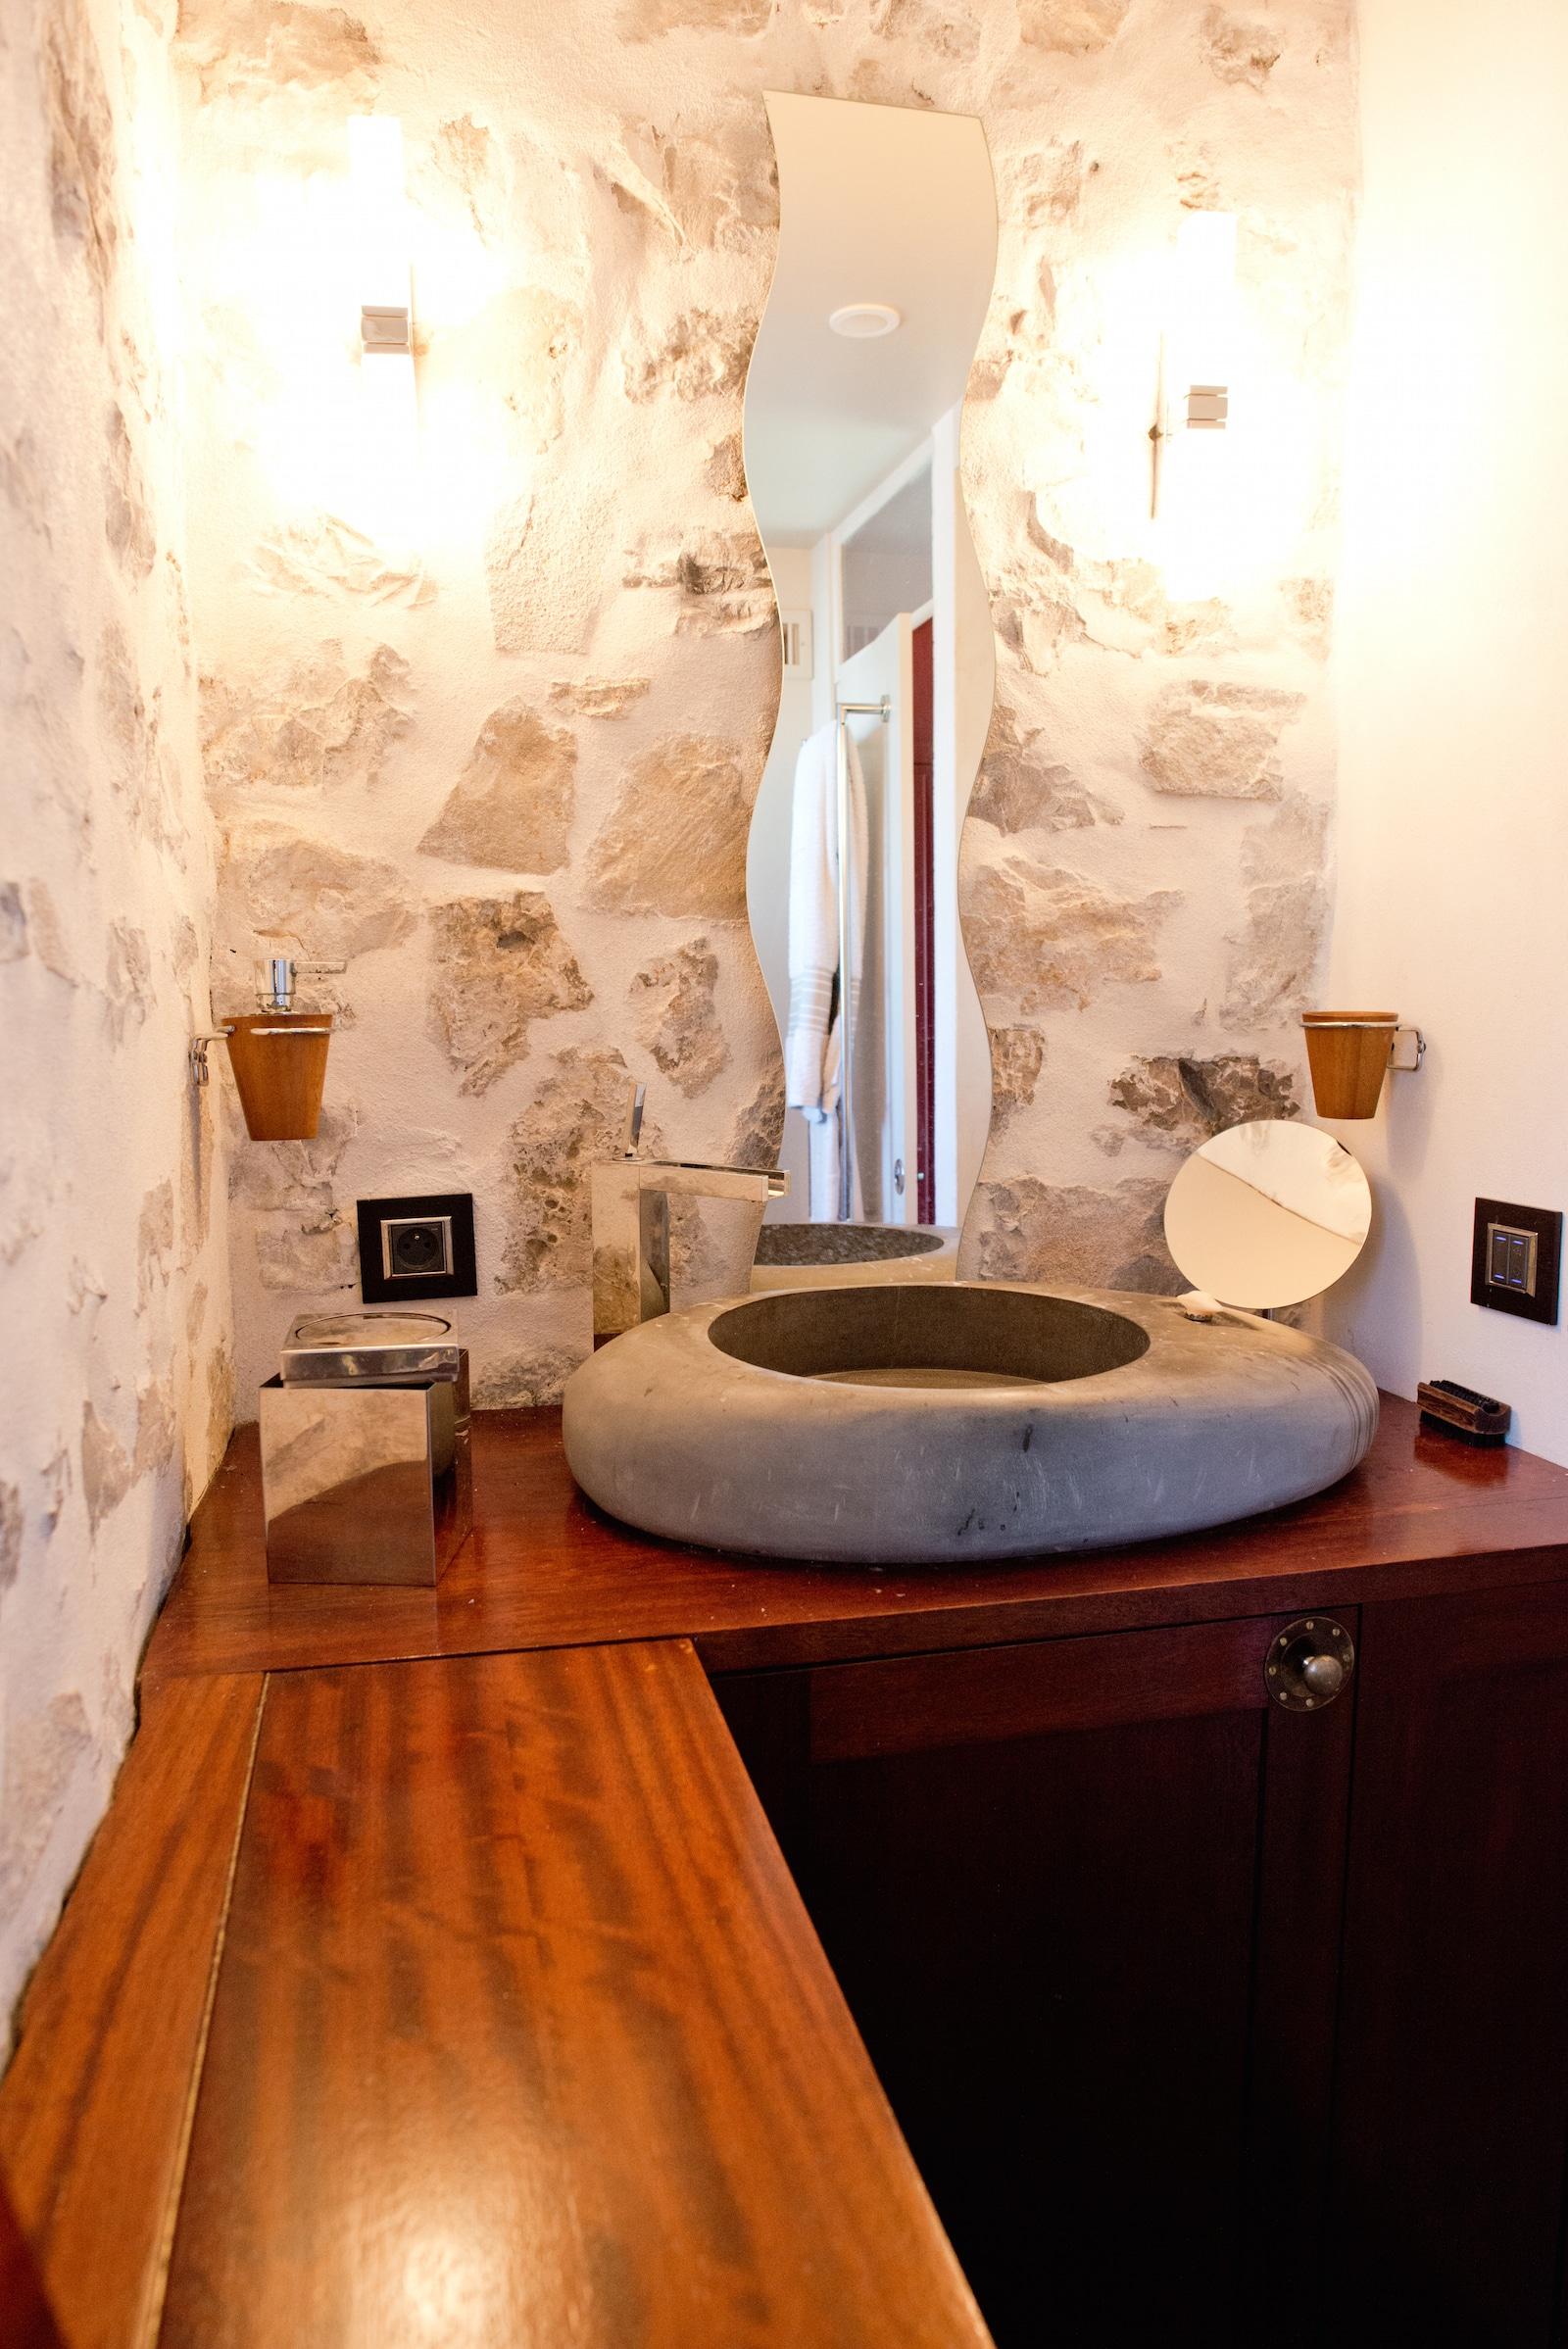 agencement-interieur-decoration-interieur-fabrication-meuble-bayonne-64-darrieumerlou-01